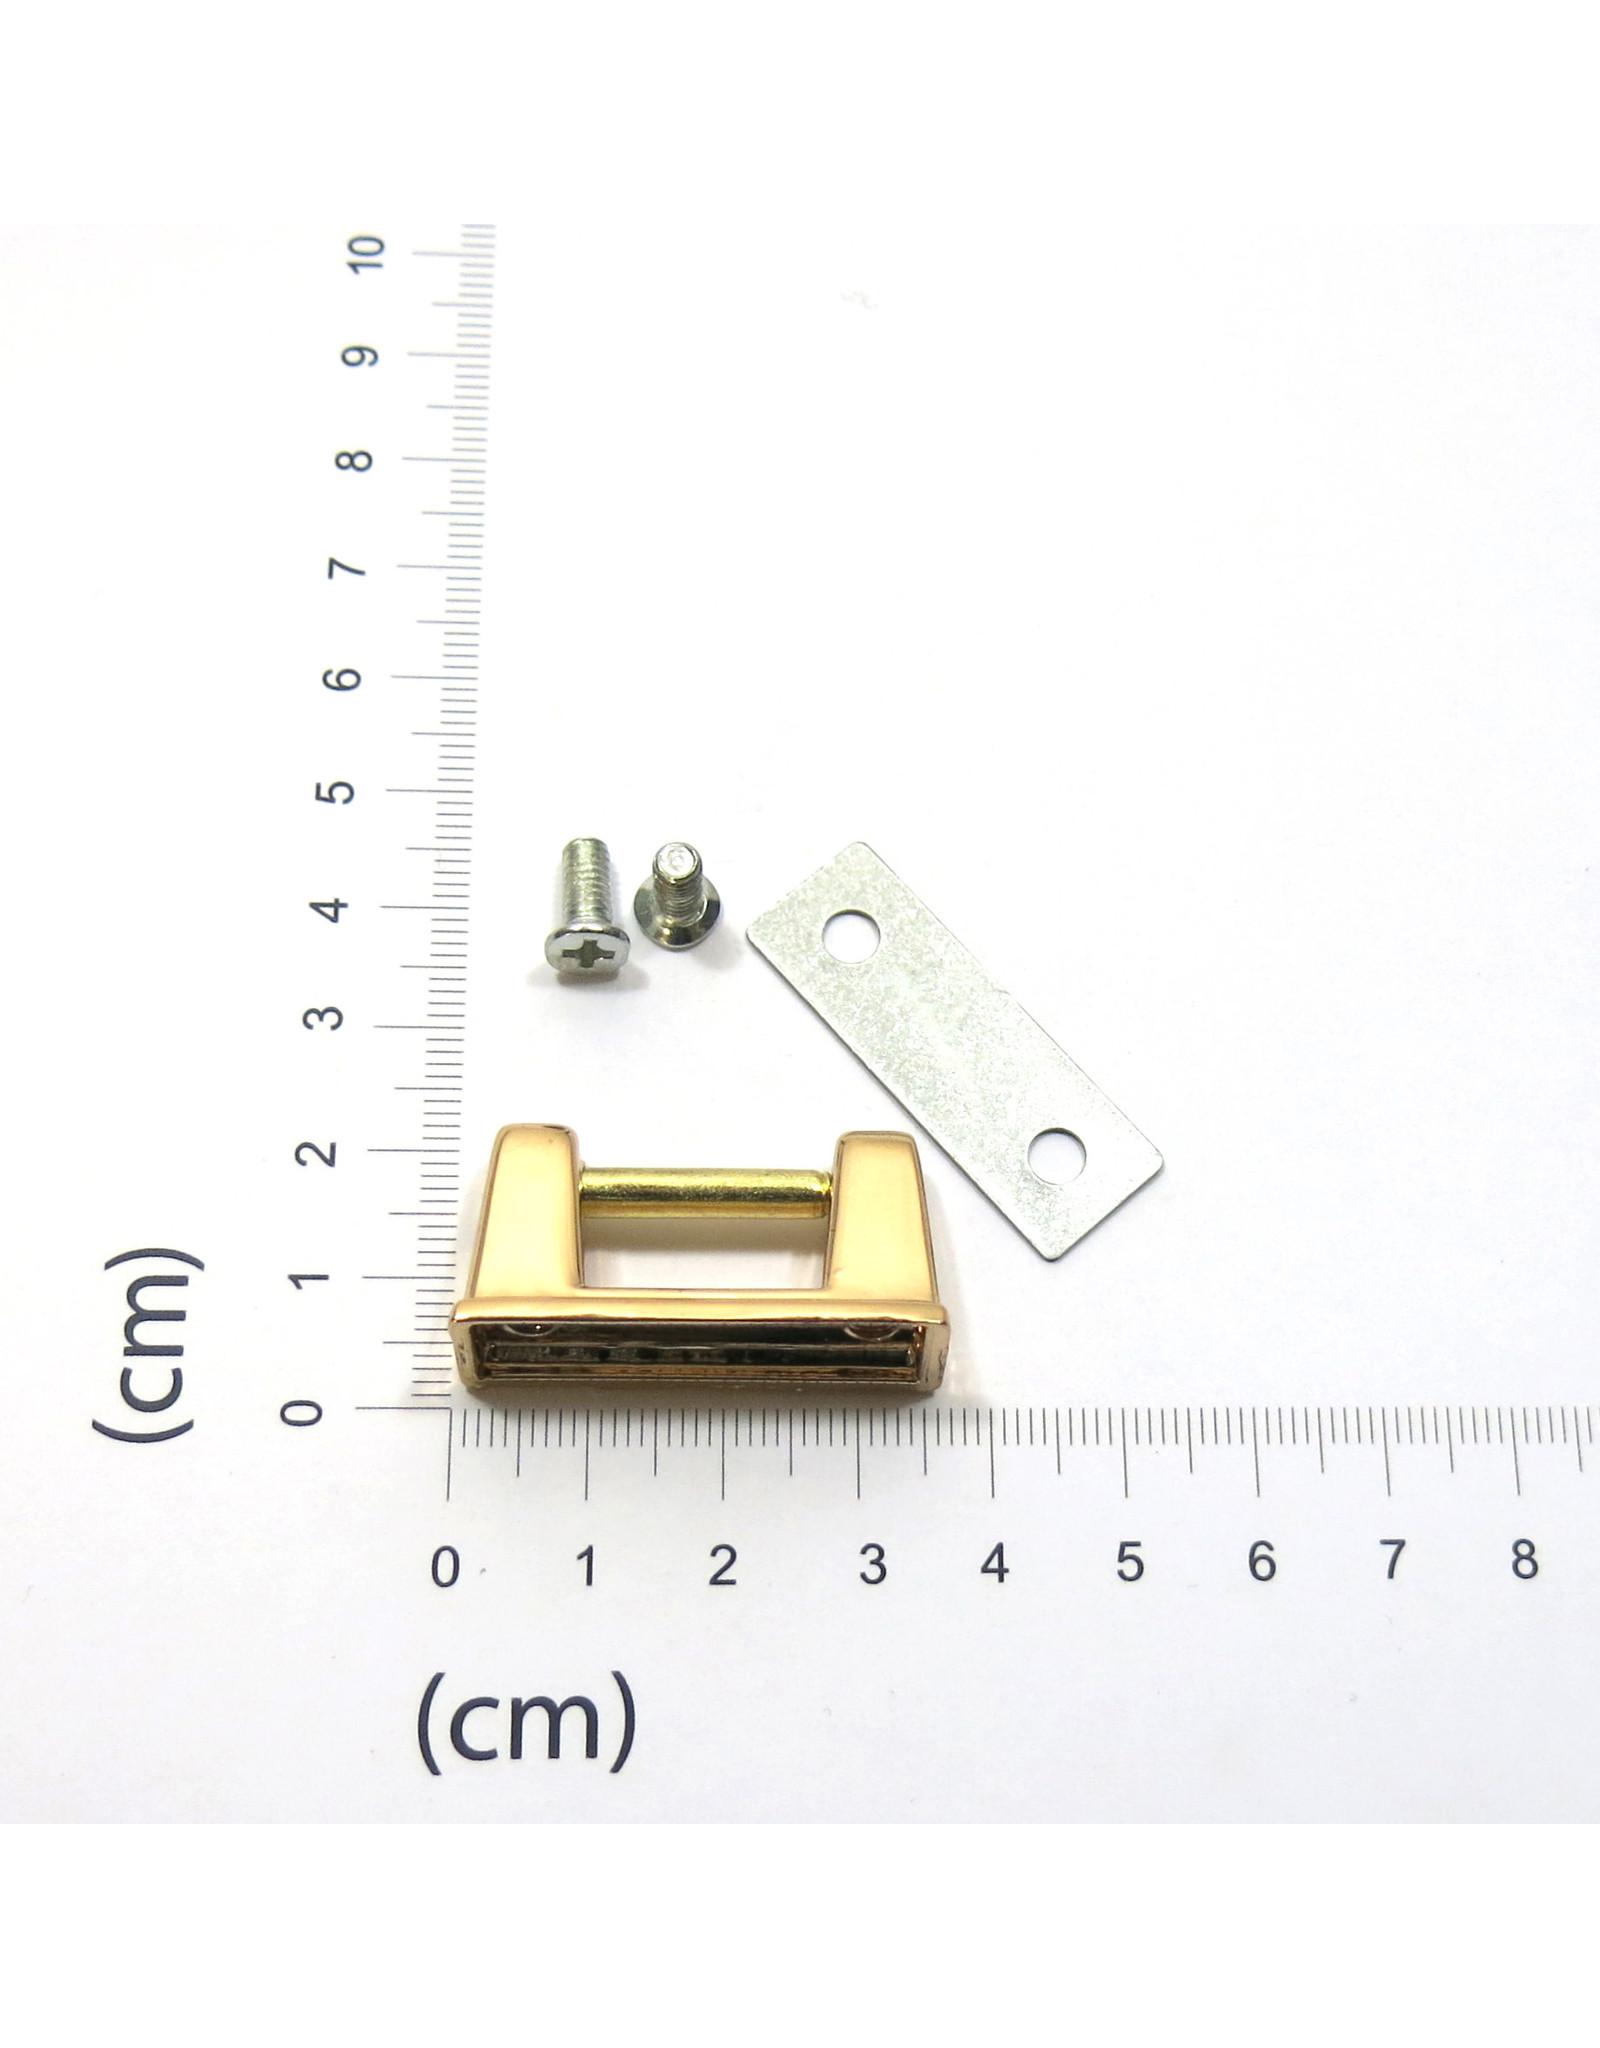 Handle holder/bridge (opening)